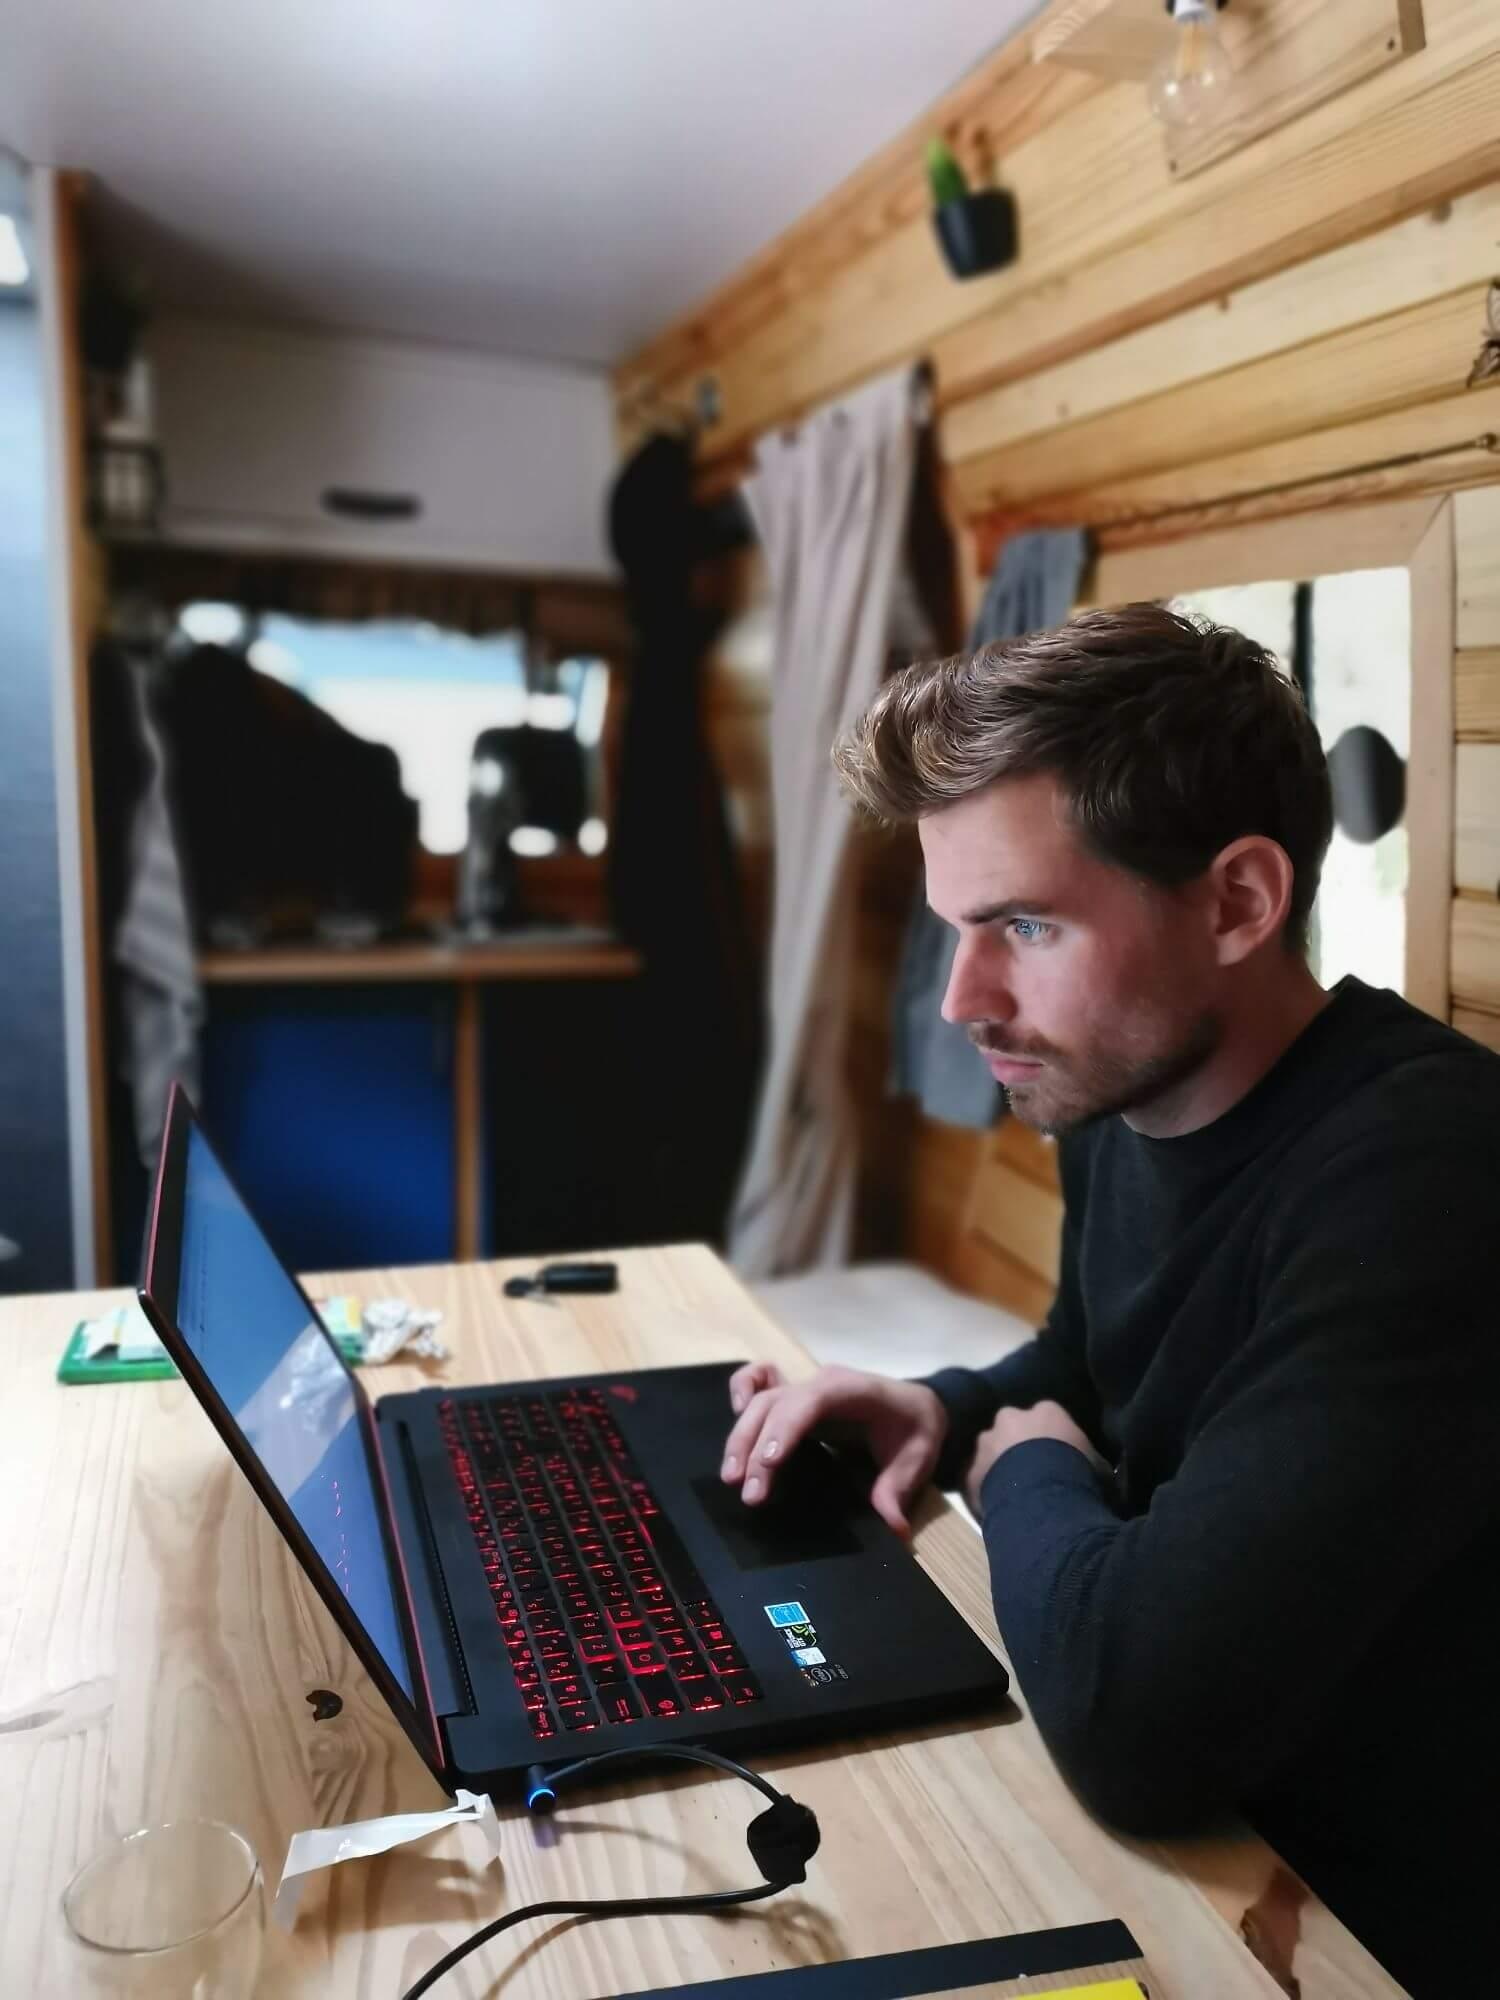 Travail, Digital Nomad, Fourgon aménagé